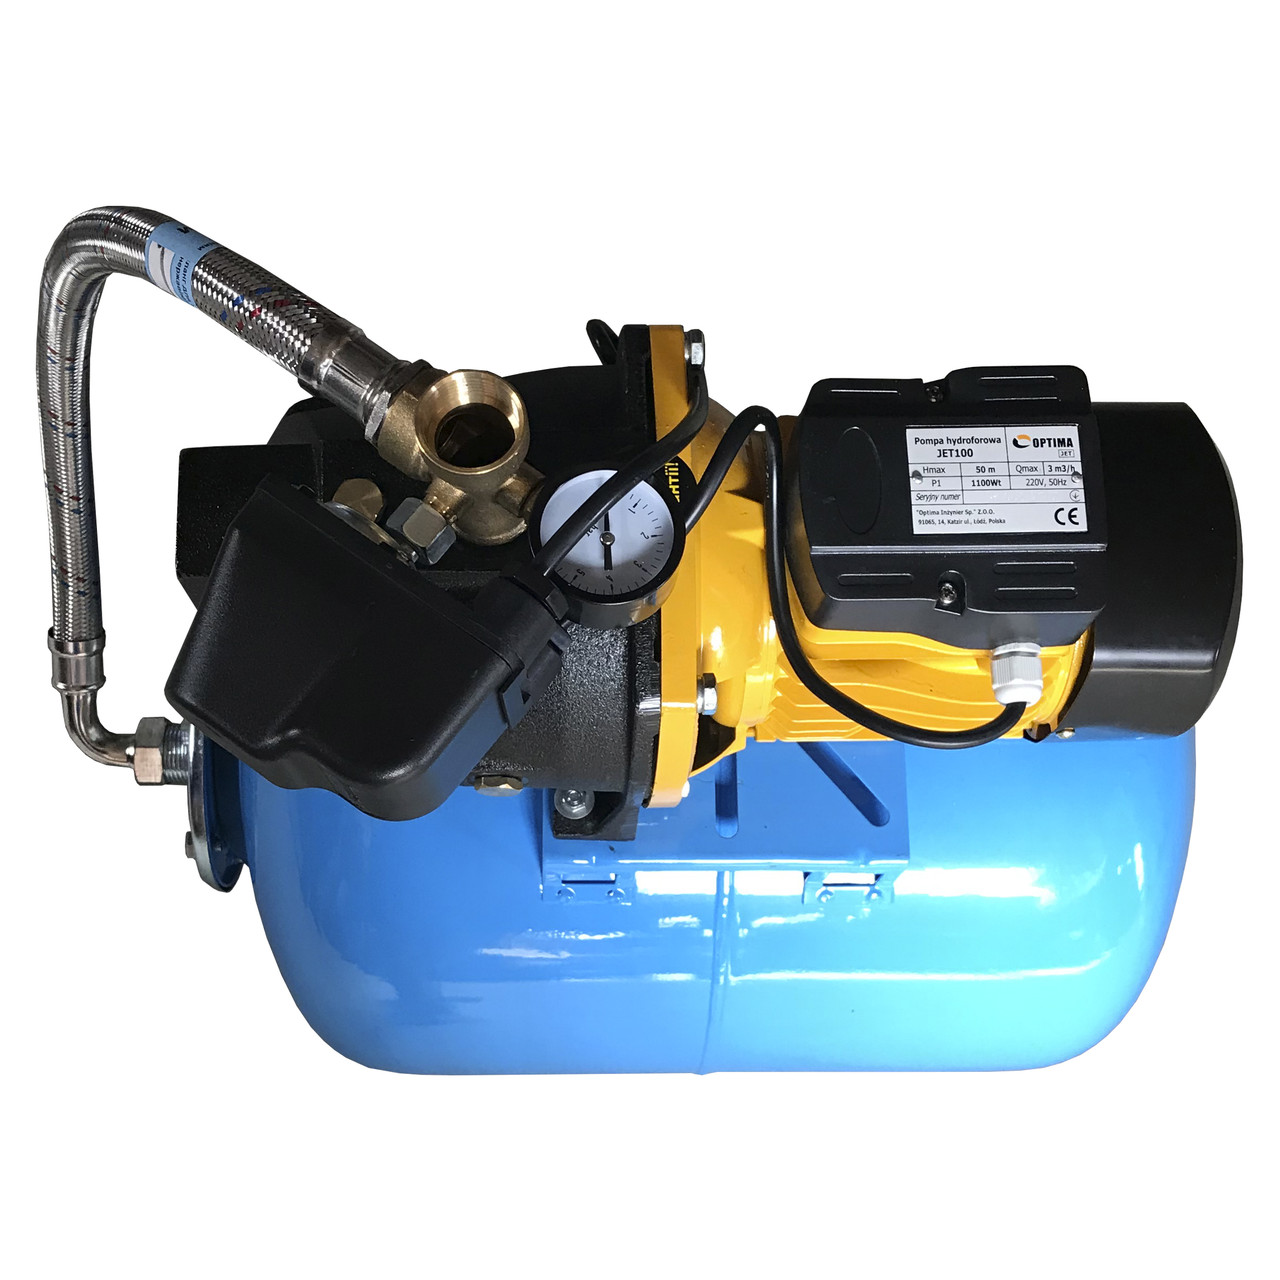 Насосна станція Optima JET100-50 1,1 кВт чавун довгий на гребінці